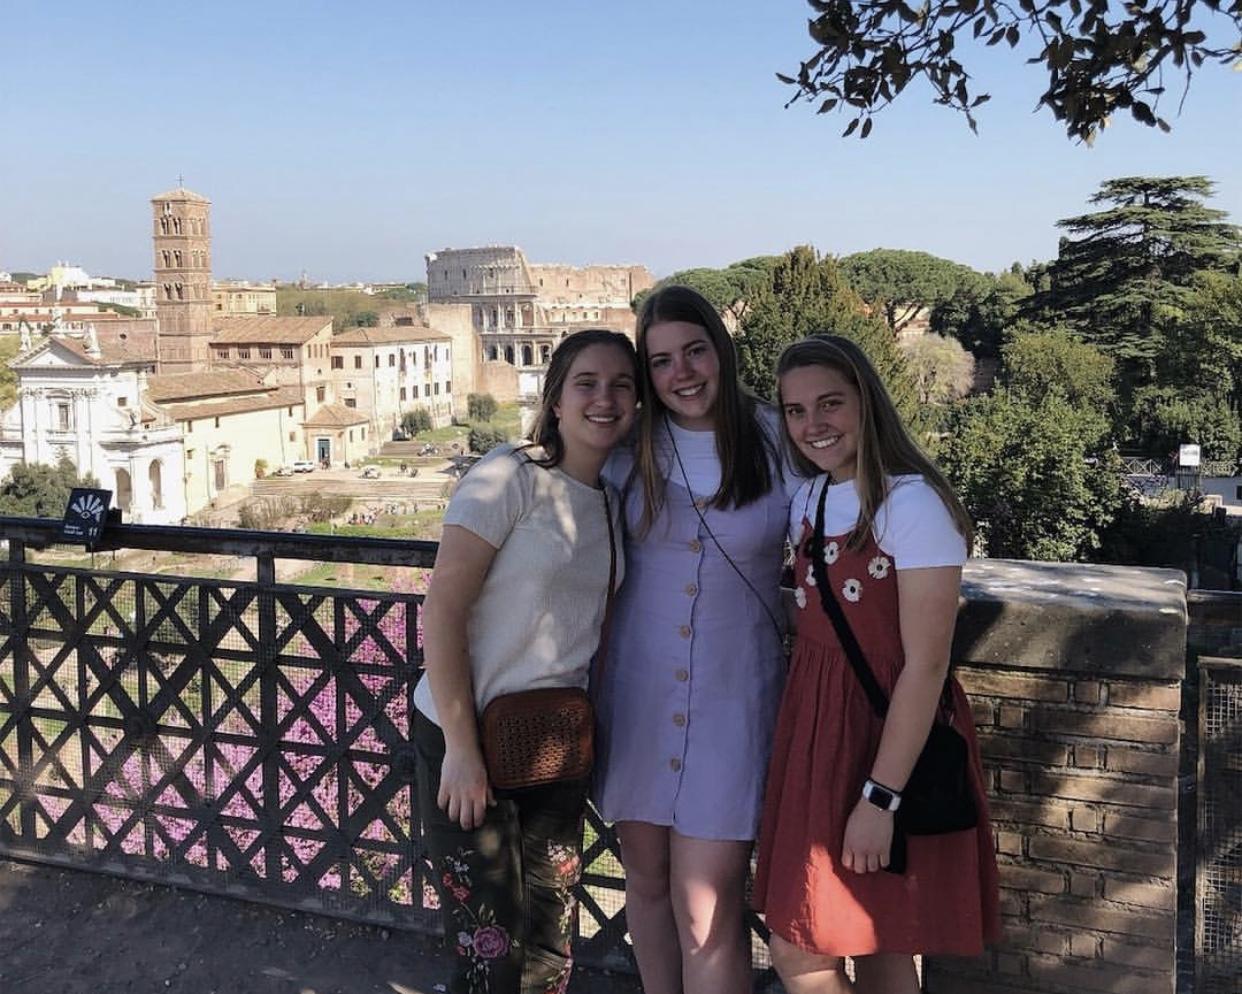 Sophomores enjoy the 2018 spring break trip to Italy.